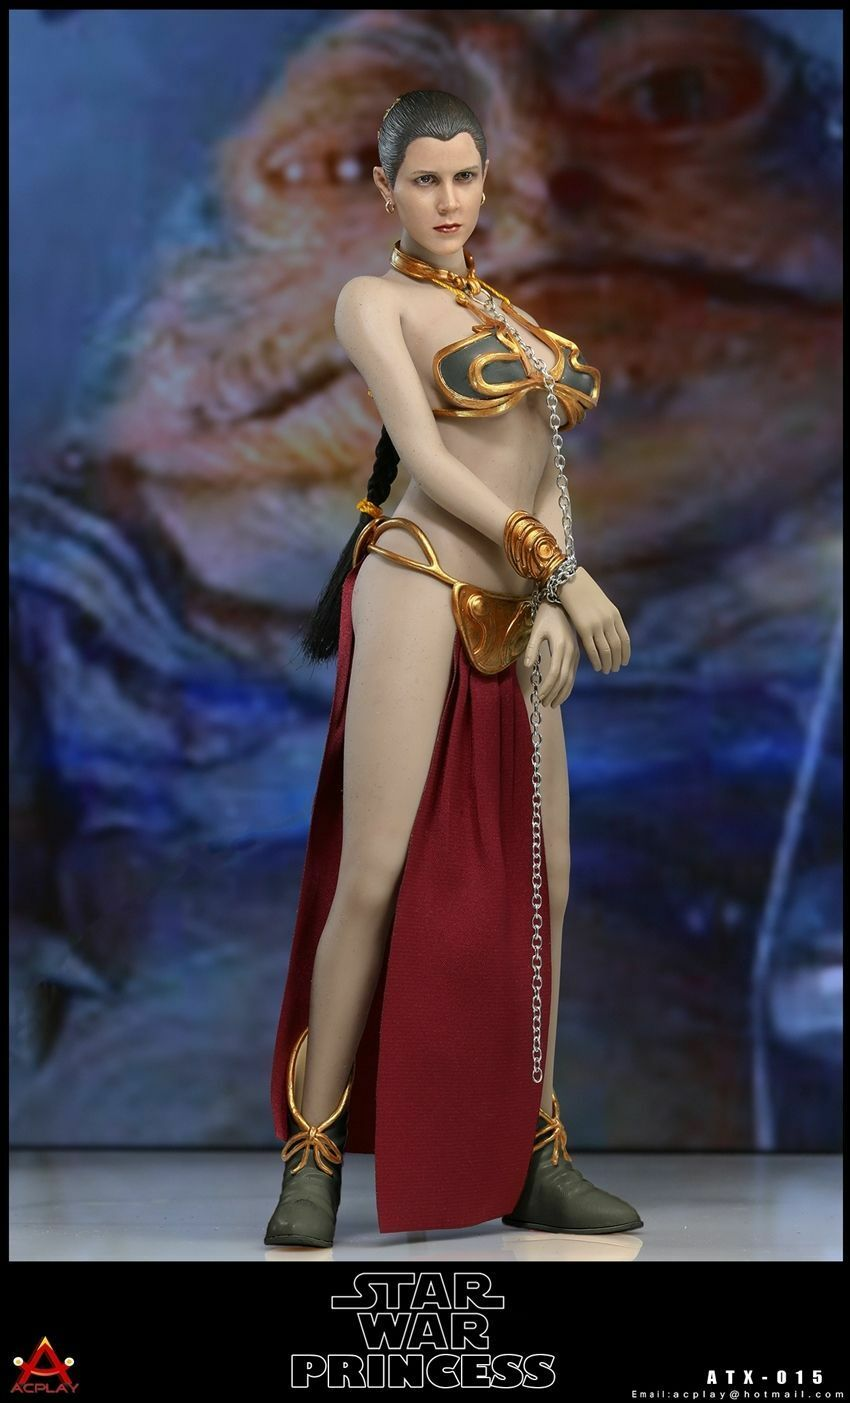 1 6 Princesa Leia Organa Star Wars Esclavo Conjunto Set para PHICEN Hot Toys ❶ USA ❶